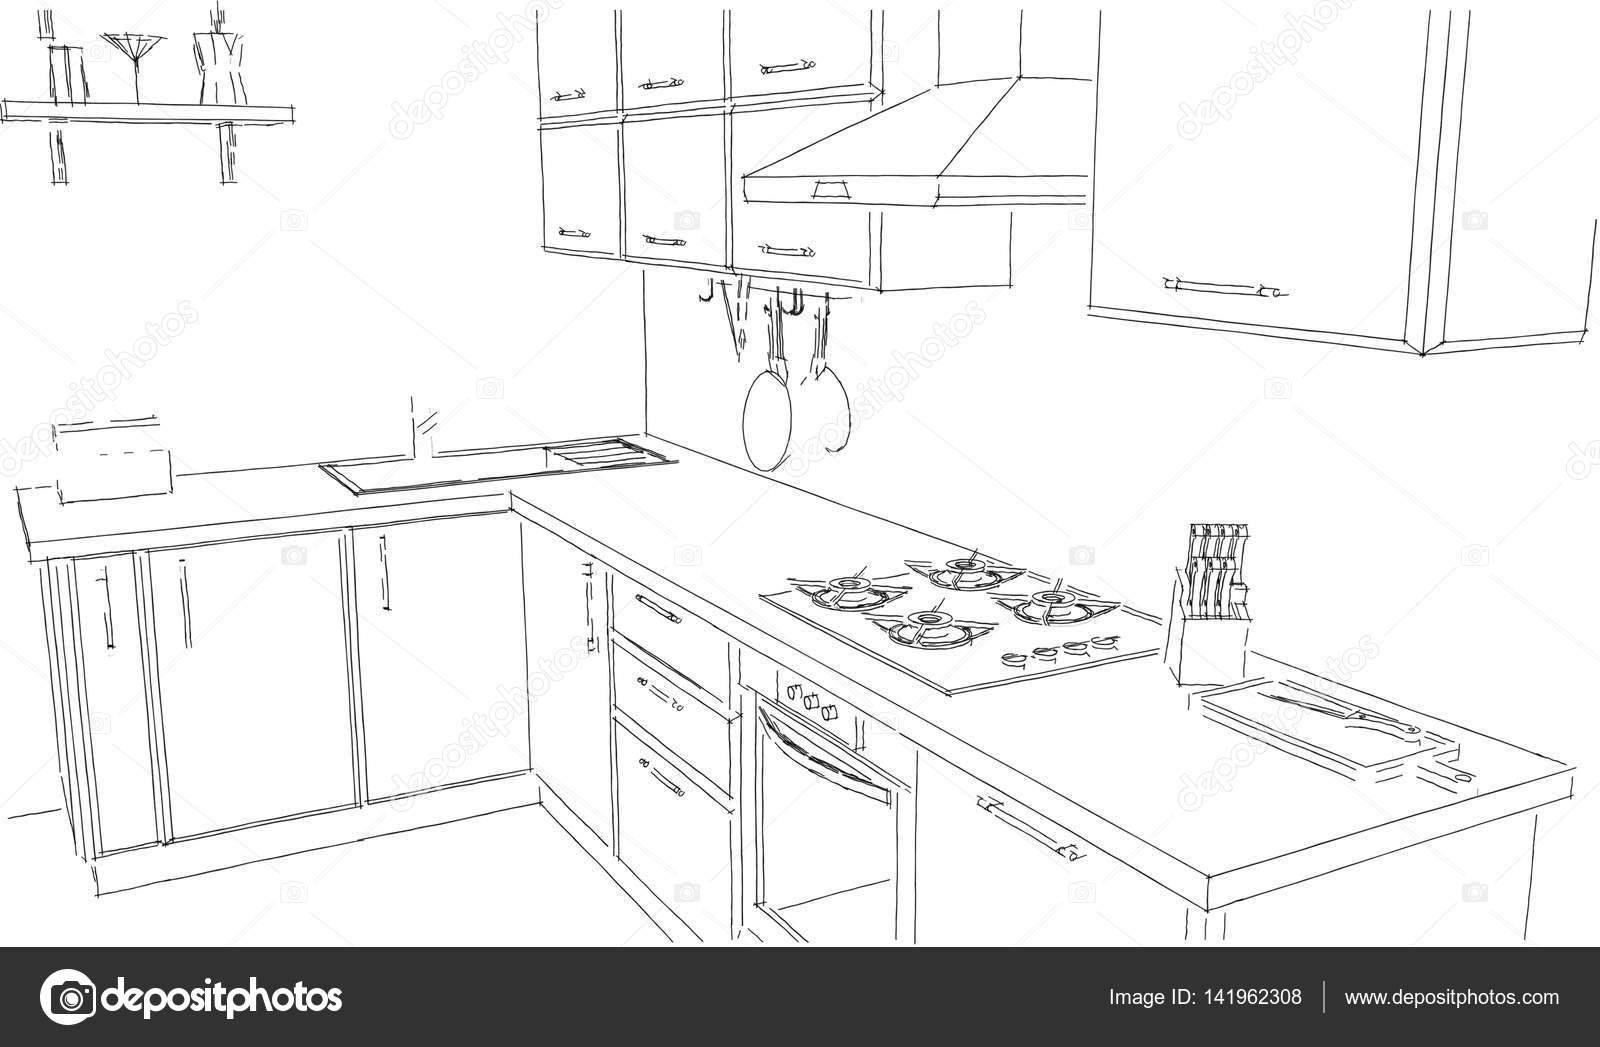 Dessiner cuisine 3d awesome dessiner cuisine d dessindjpg for Ma cuisine en 3d gratuit